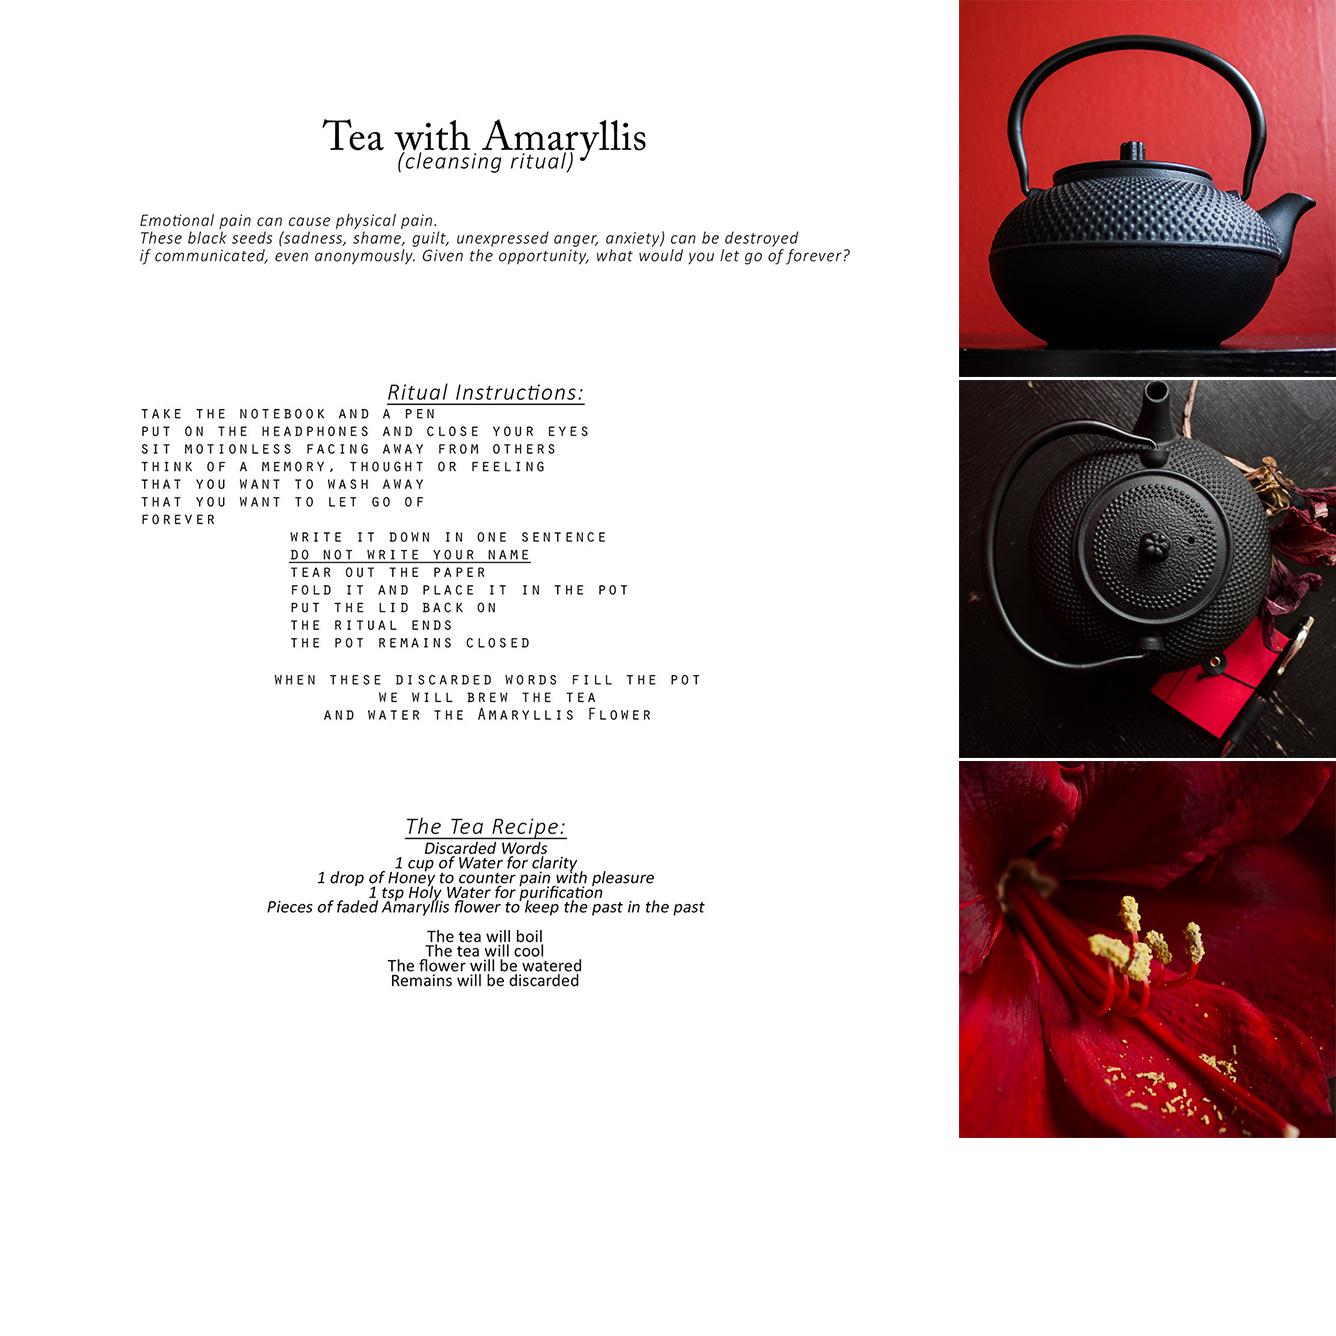 Tea with Amaryllis collage